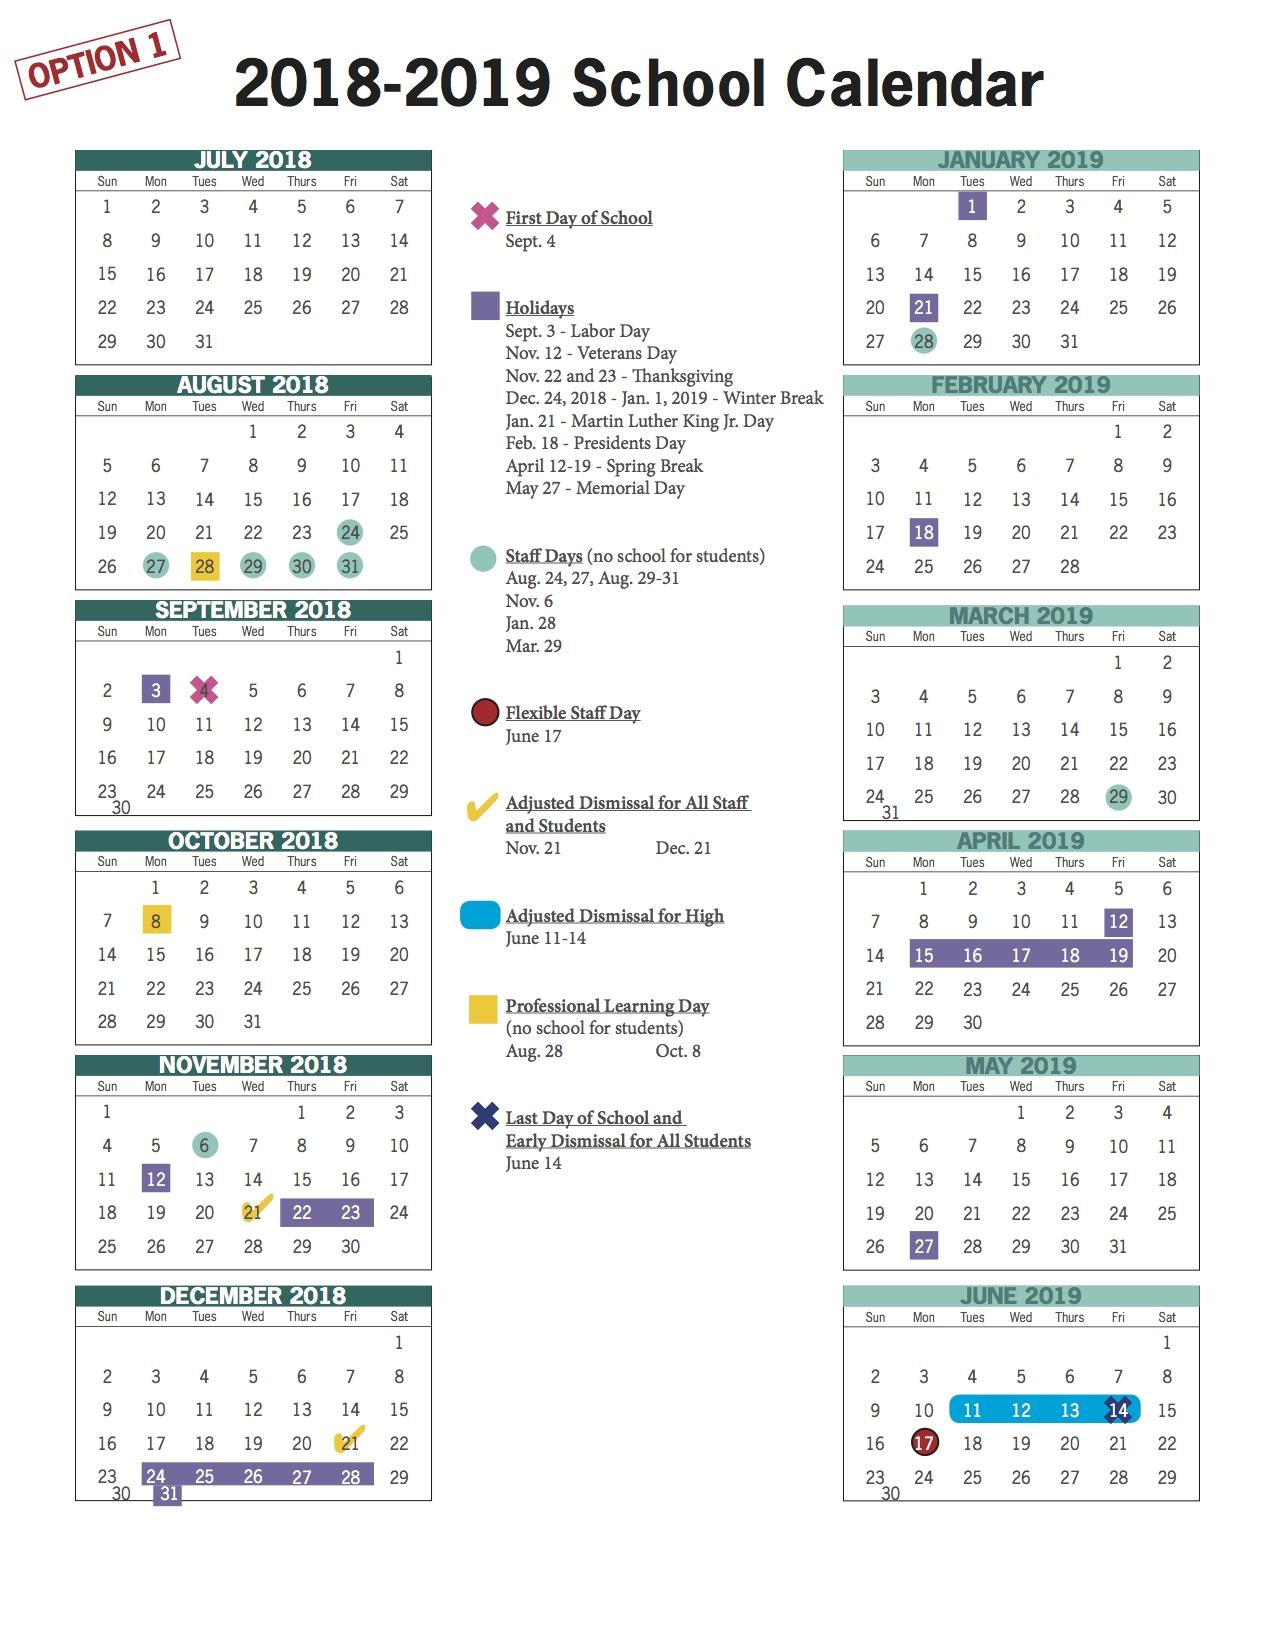 Vbcps E-Town Hall - 2018-2019 And 2019-2020 School Calendar Review regarding Embedded Calendar 2020